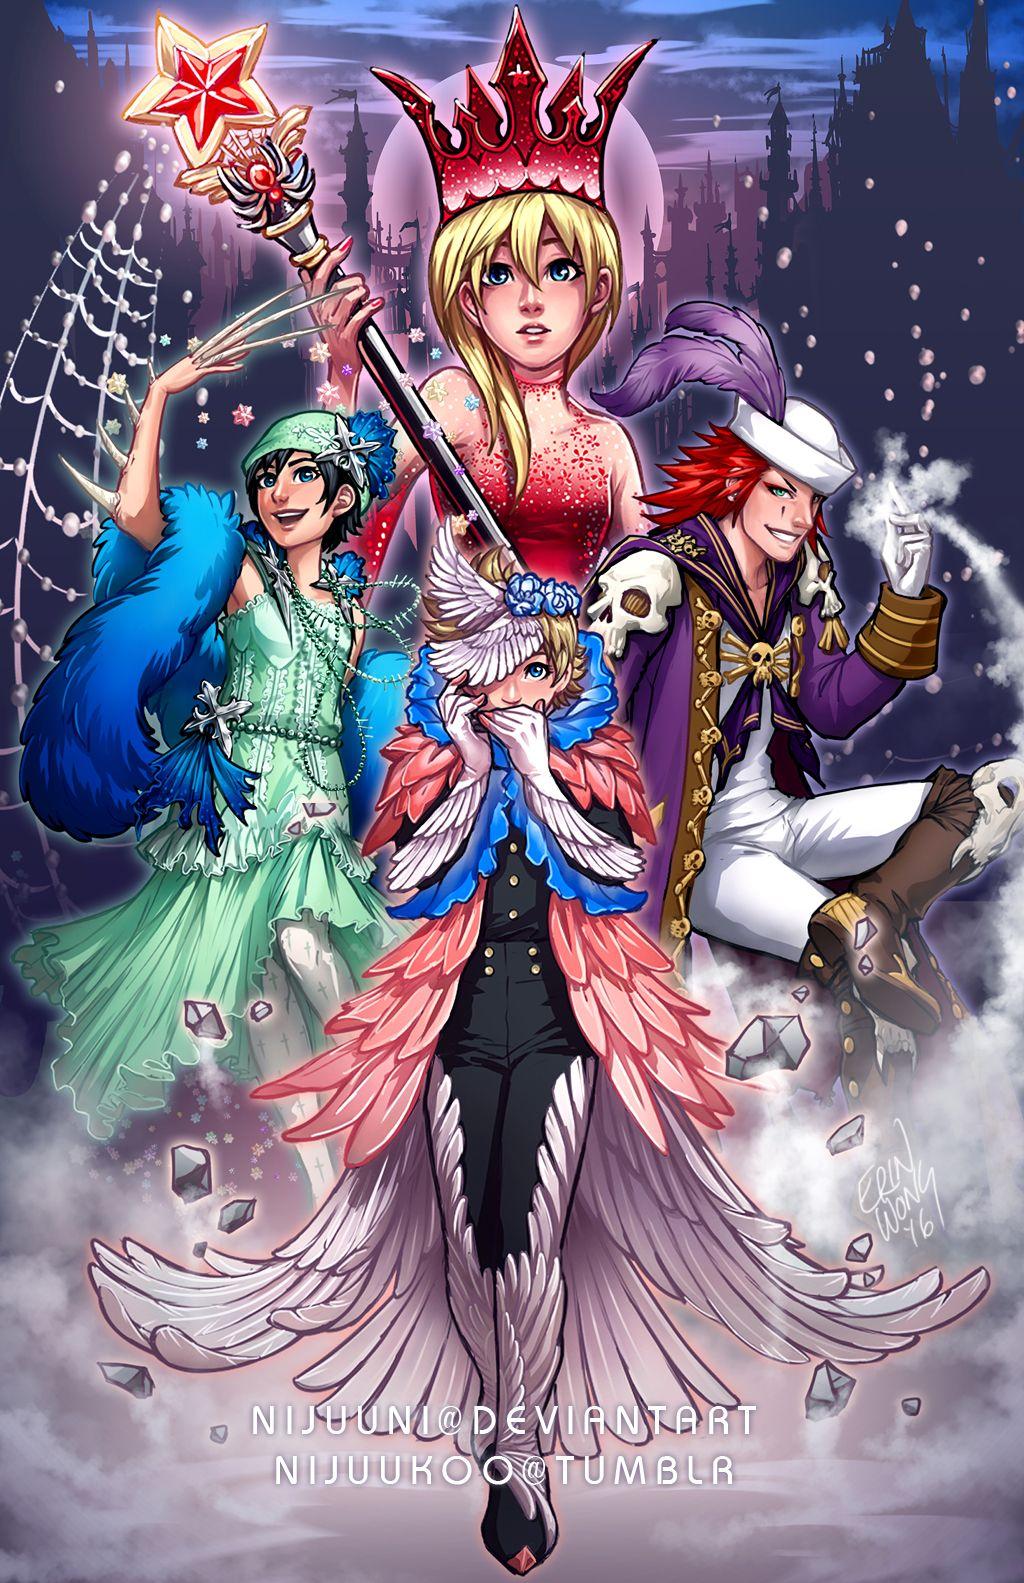 Fantasy Four Shindan Maker By Nijuuni Deviantart Com On Deviantart This Is So Weird And Yet I Lik Disney Kingdom Hearts Kingdom Hearts Art Kingdom Hearts